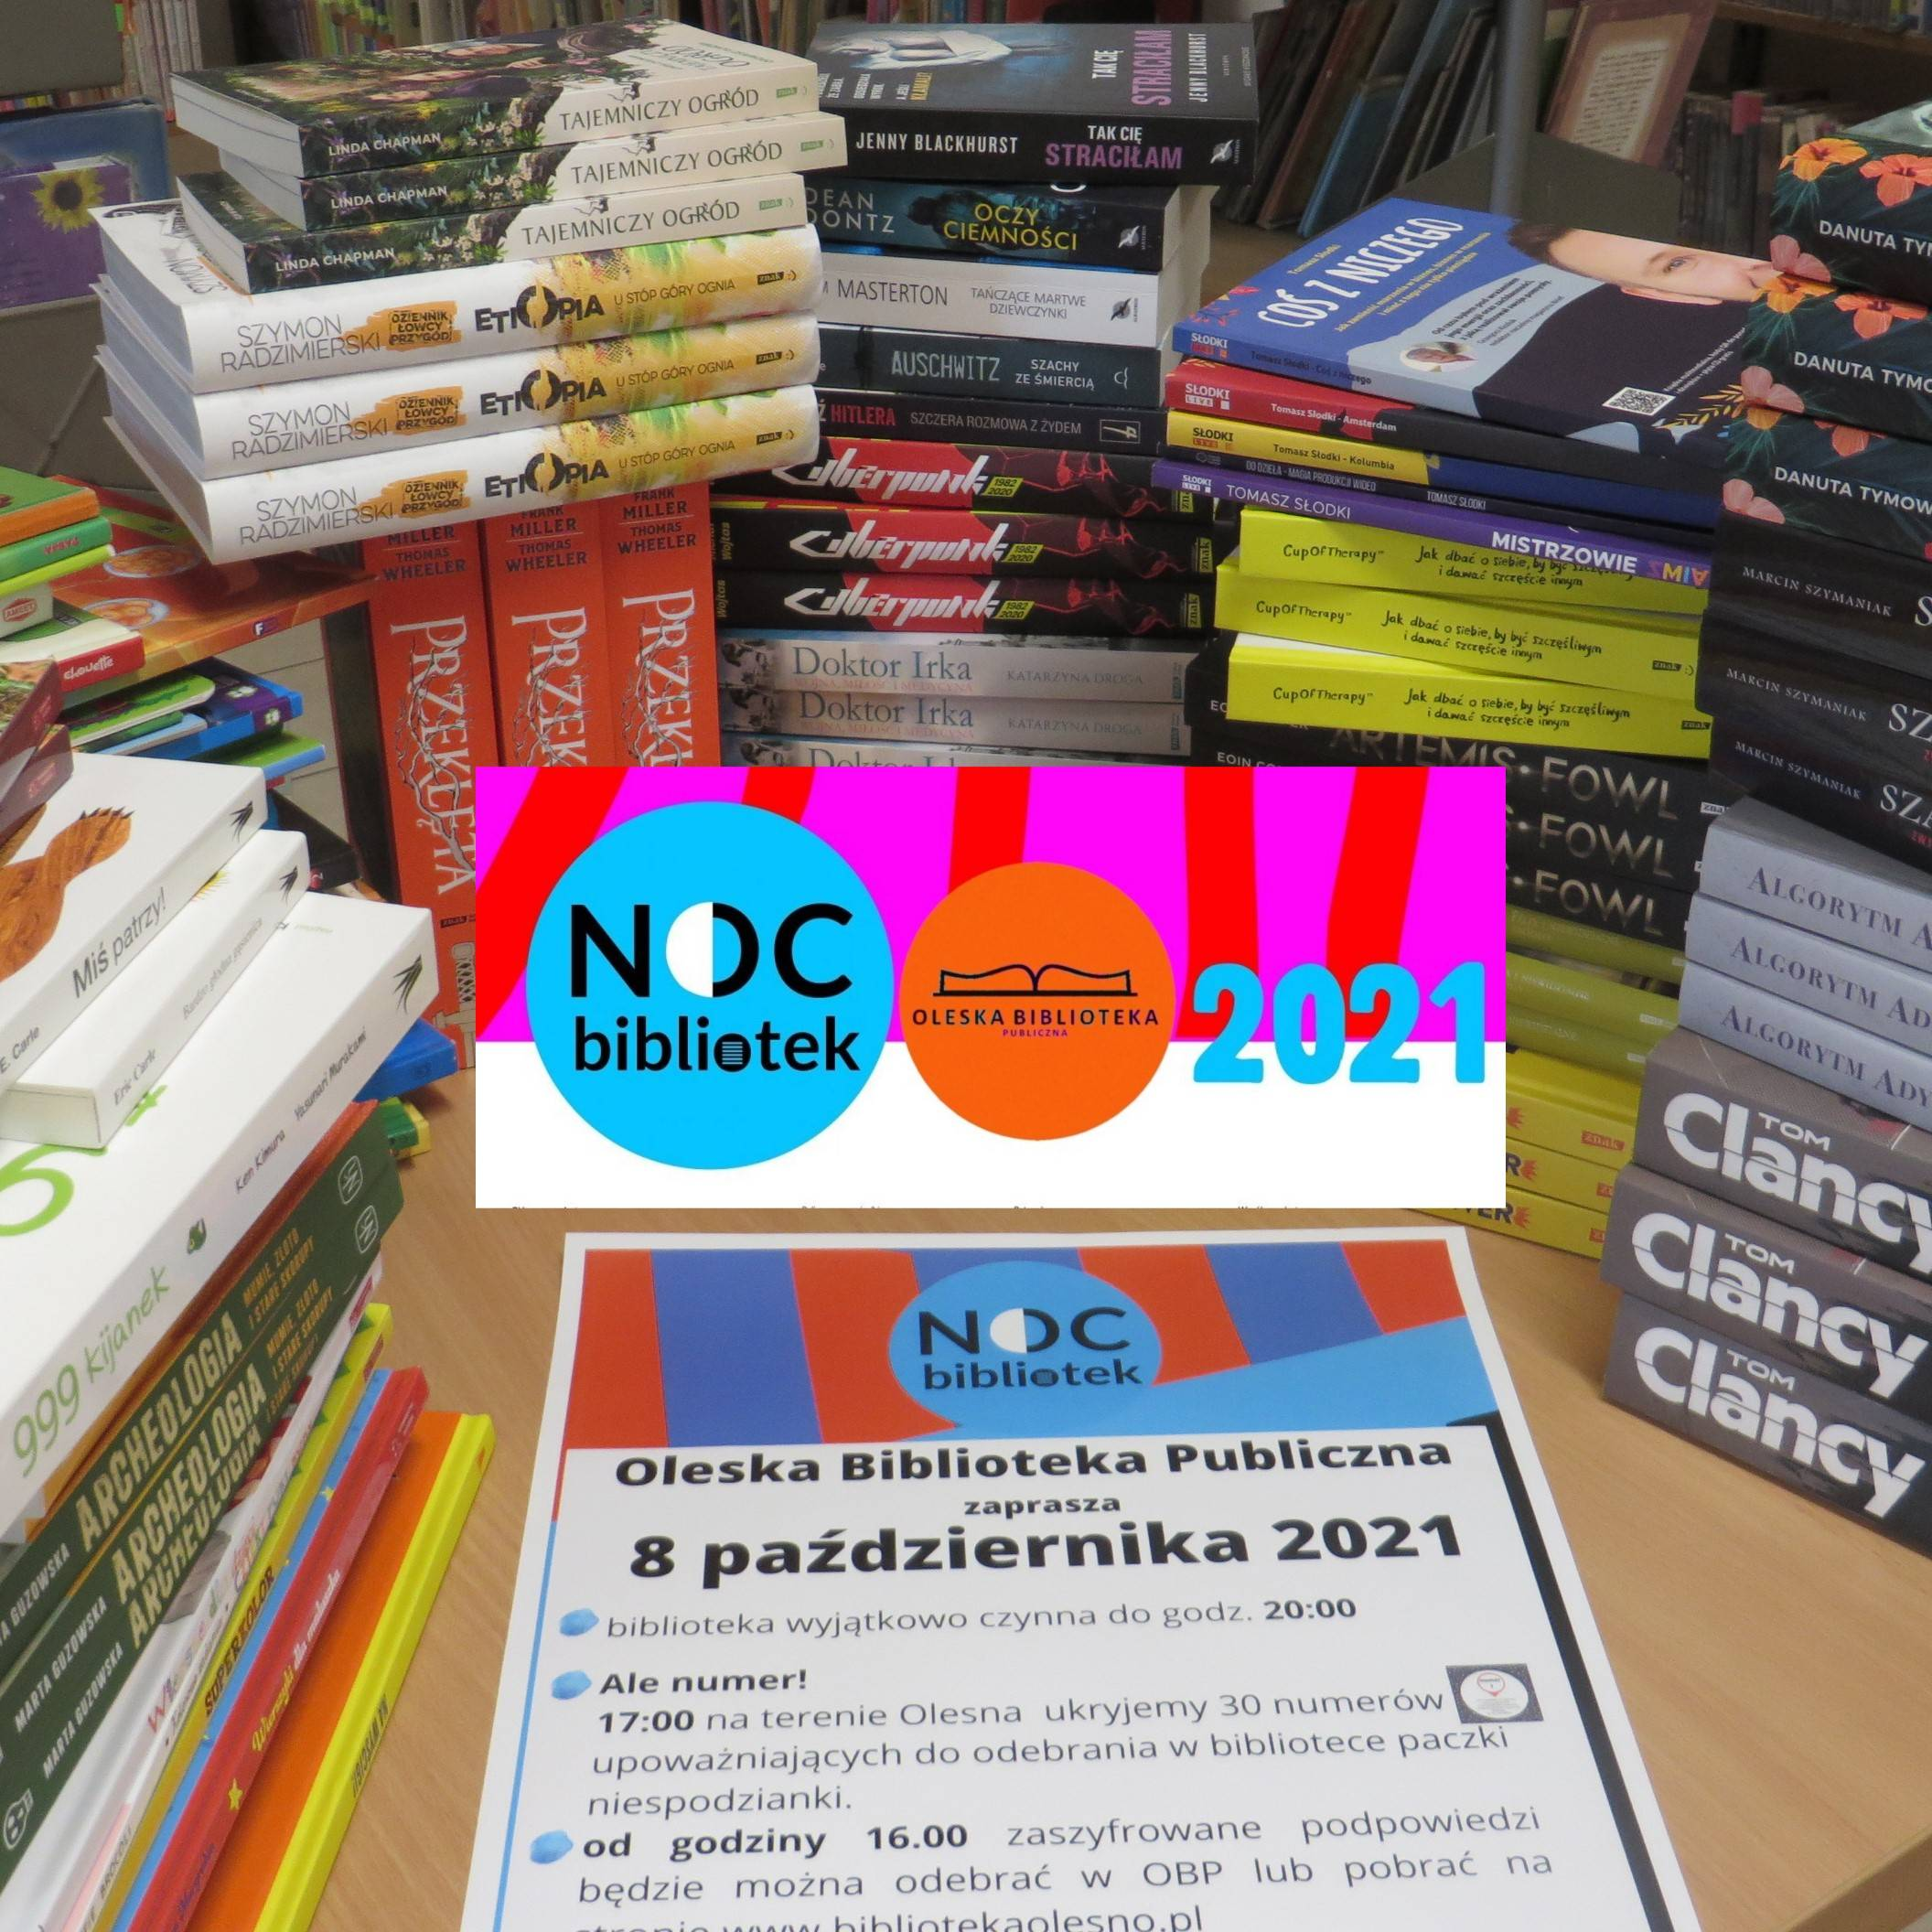 Noc Bibliotek2021 - nagrody